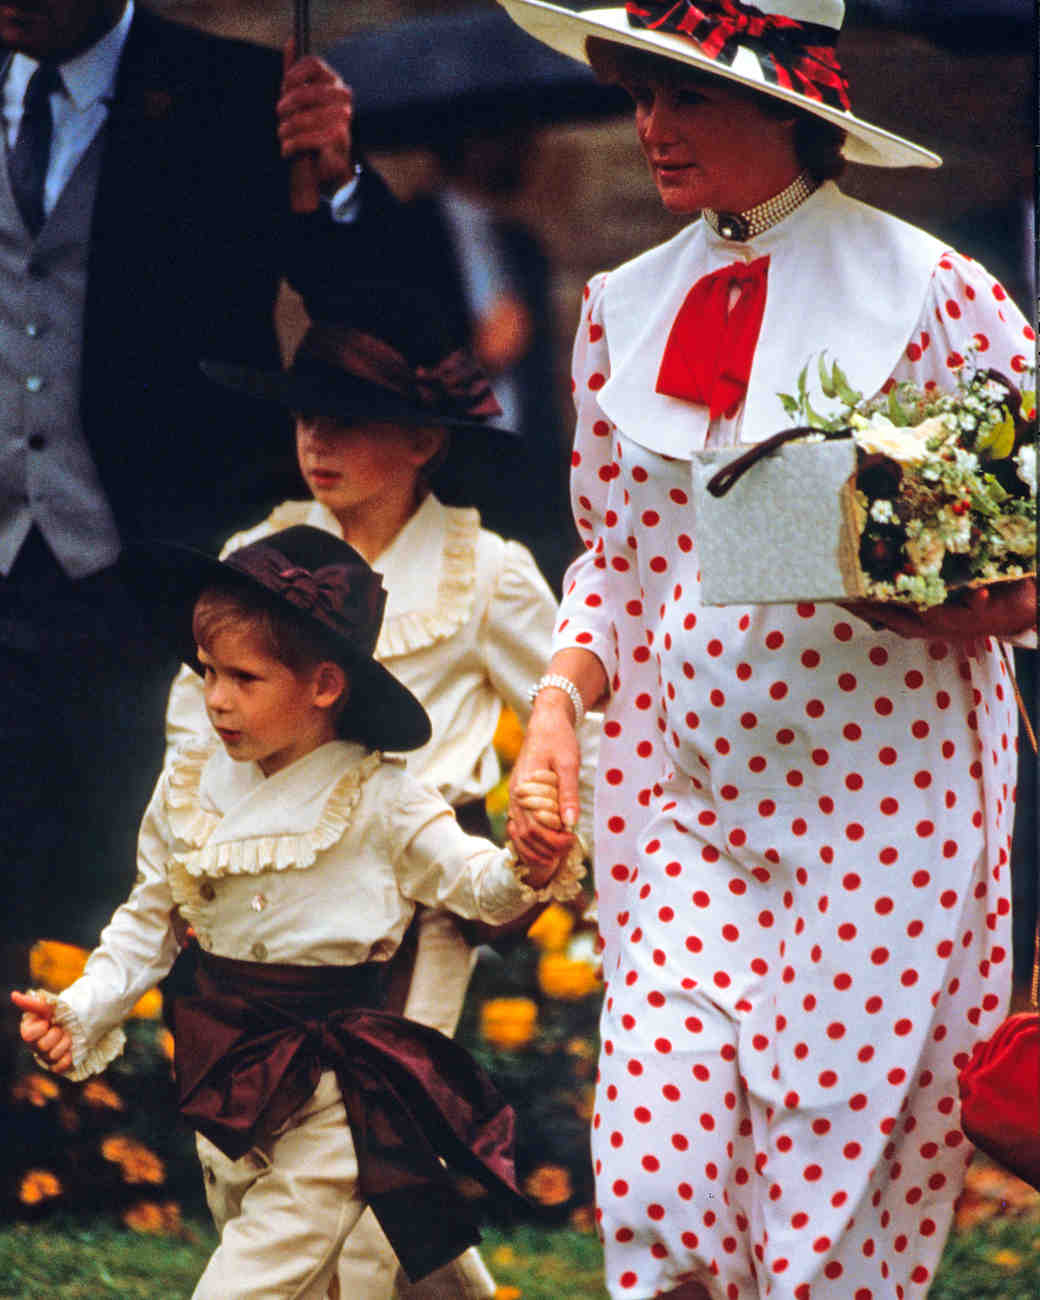 royal-children-wedding-53507531_master-0415.jpg